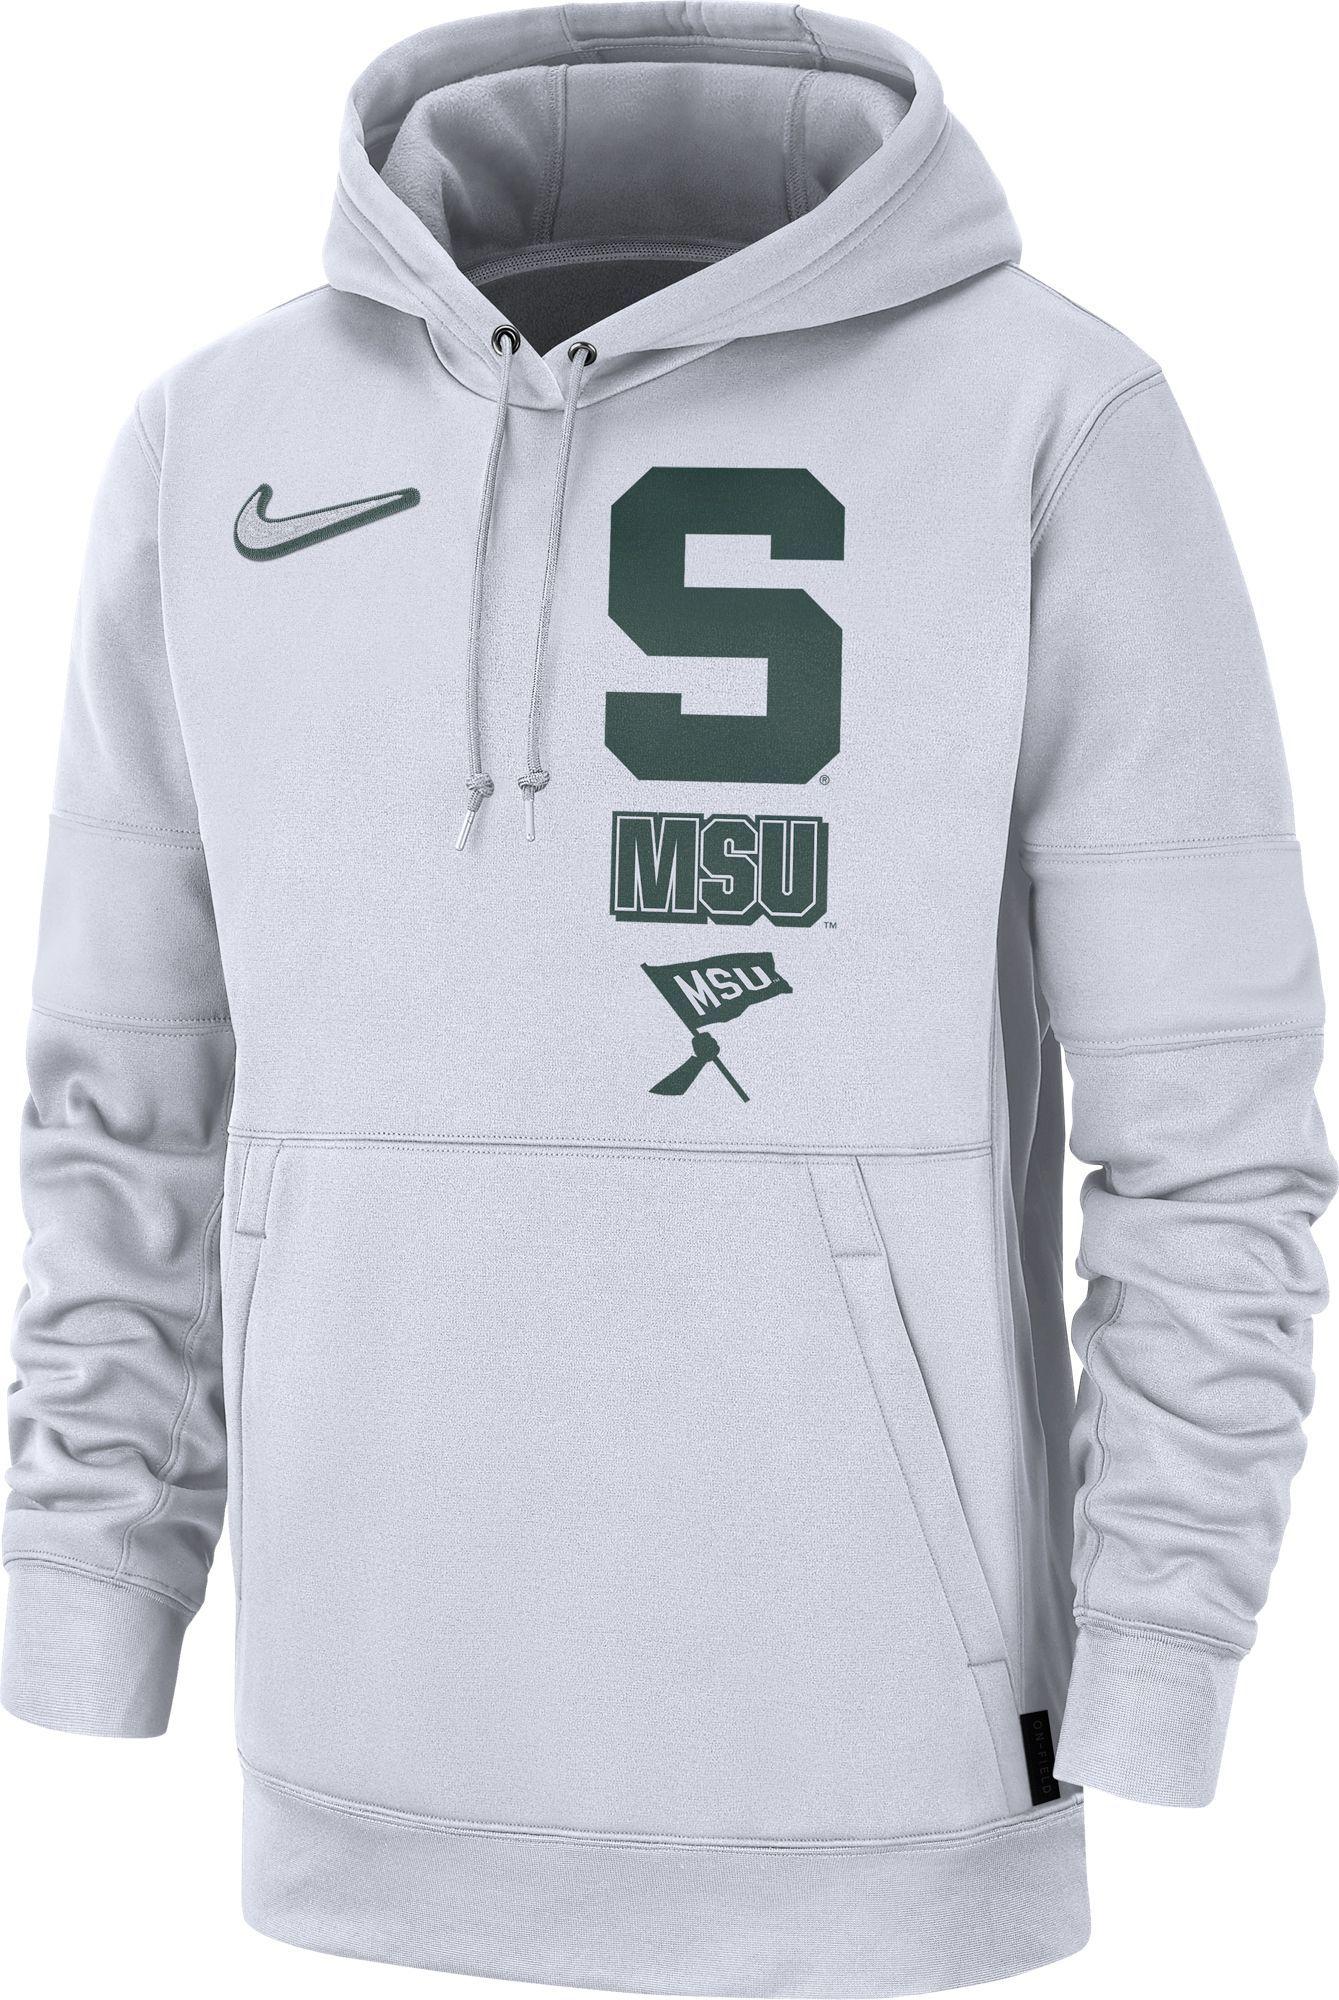 Men S Nike Michigan State Spartans Club Fleece Hoodie Hoodies Nike Men Fleece Hoodie [ 1024 x 1024 Pixel ]